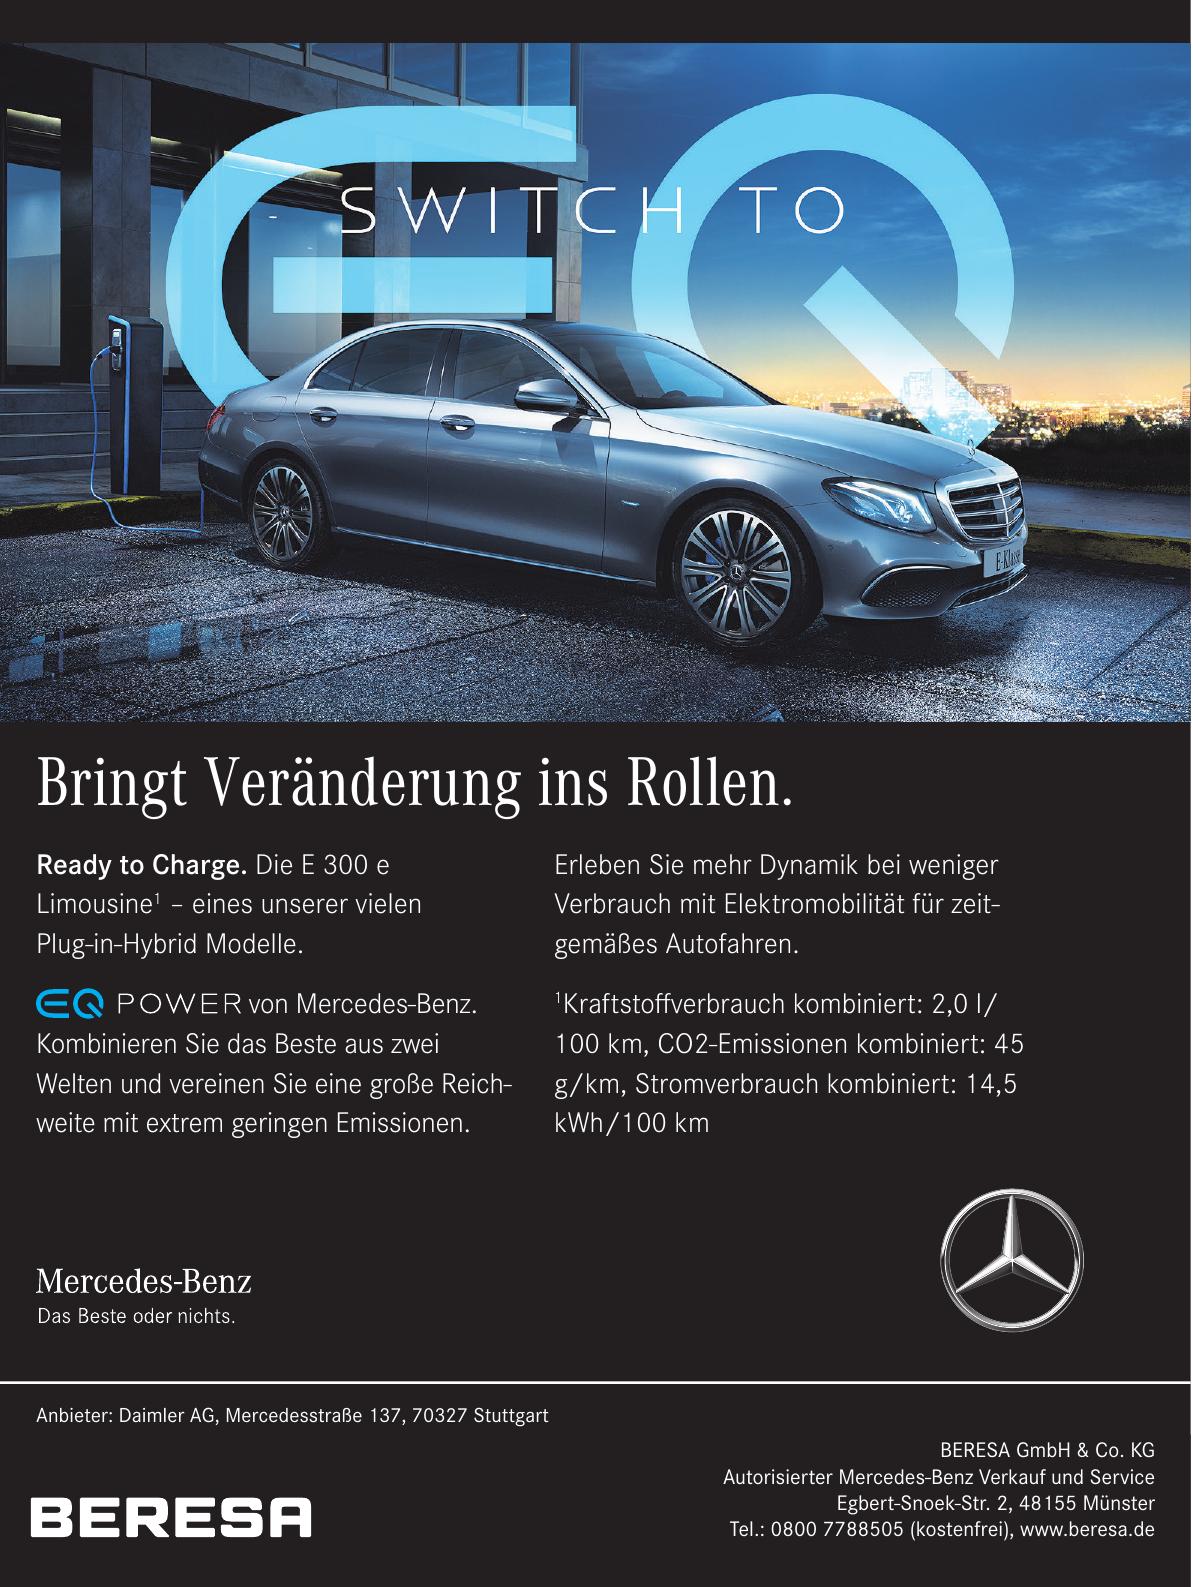 Beresa GmbH & Co. KG